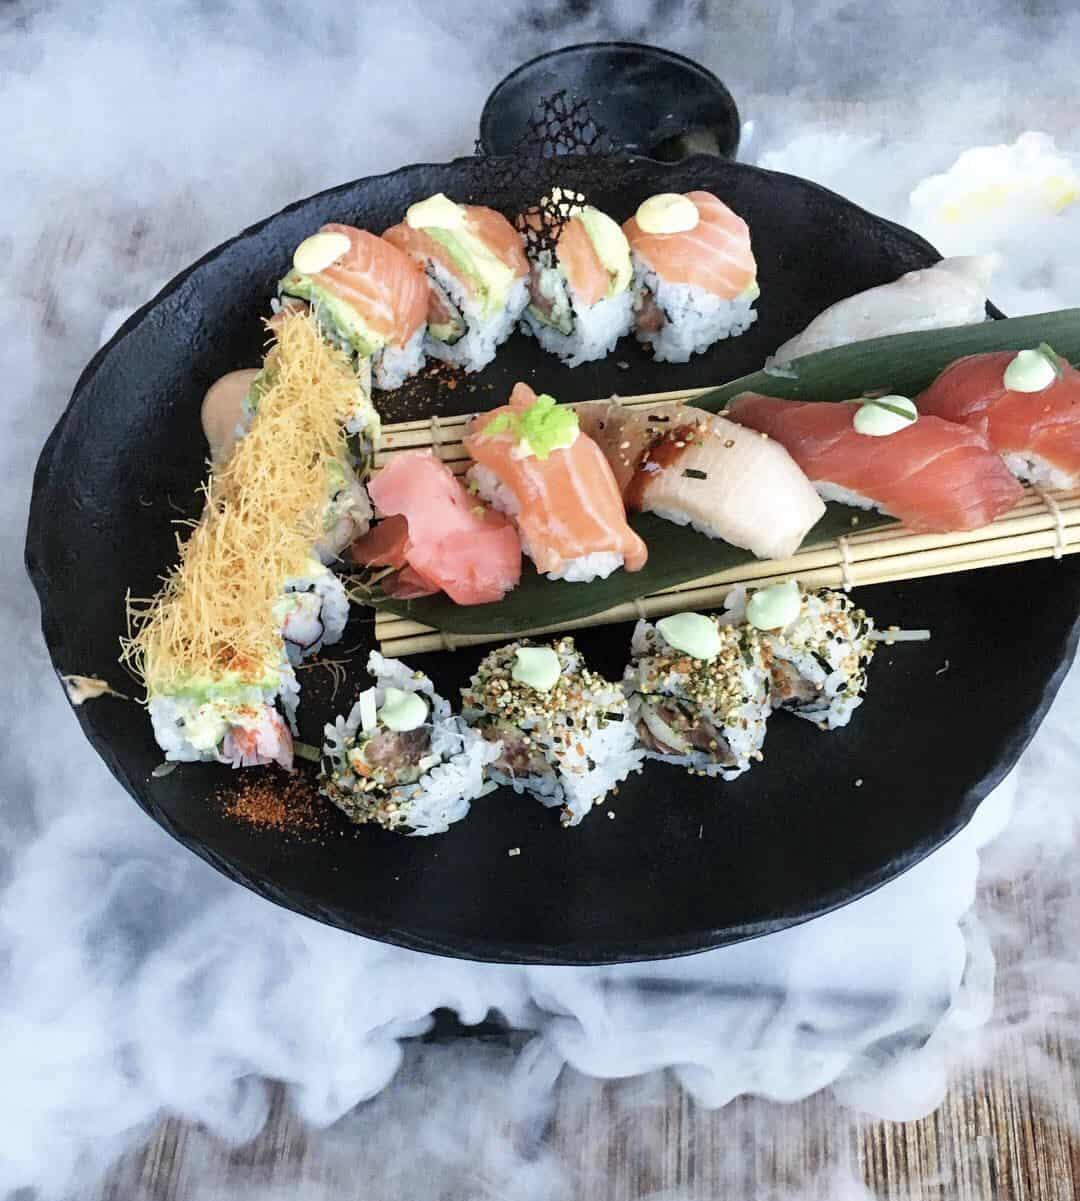 hoeveel sushi rijst per persoon? sushi informatie. sushi weetjes. sushi feitjes.